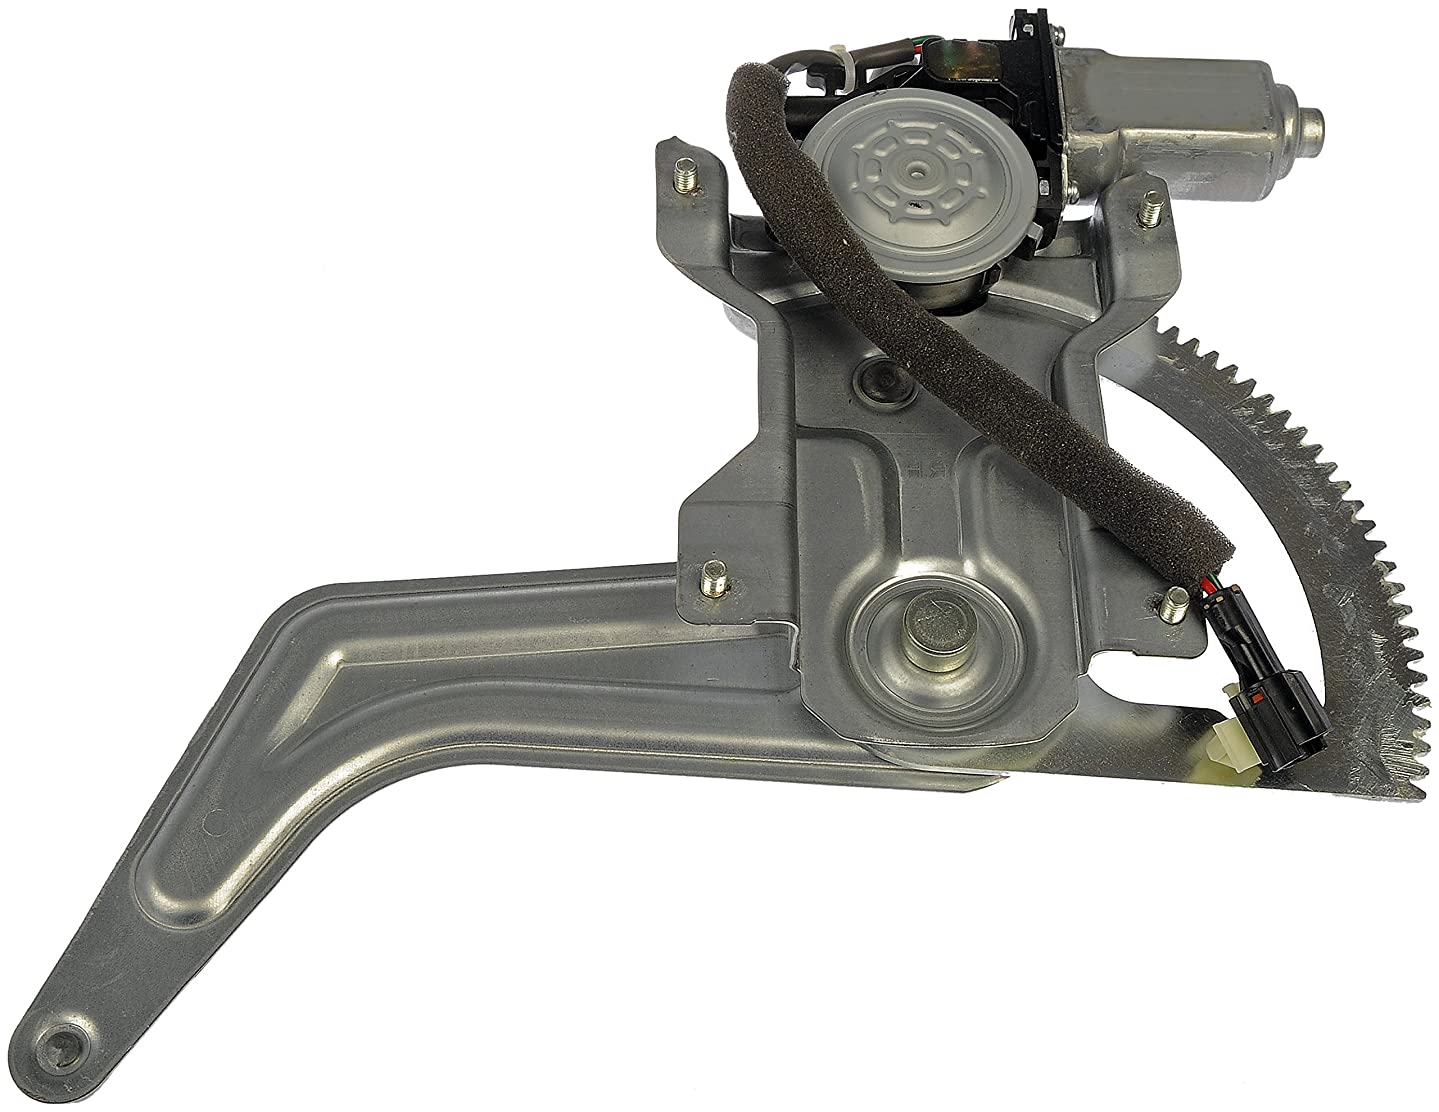 Dorman 748-409 Rear Driver Side Power Window Regulator and Motor Assembly for Select Kia Models